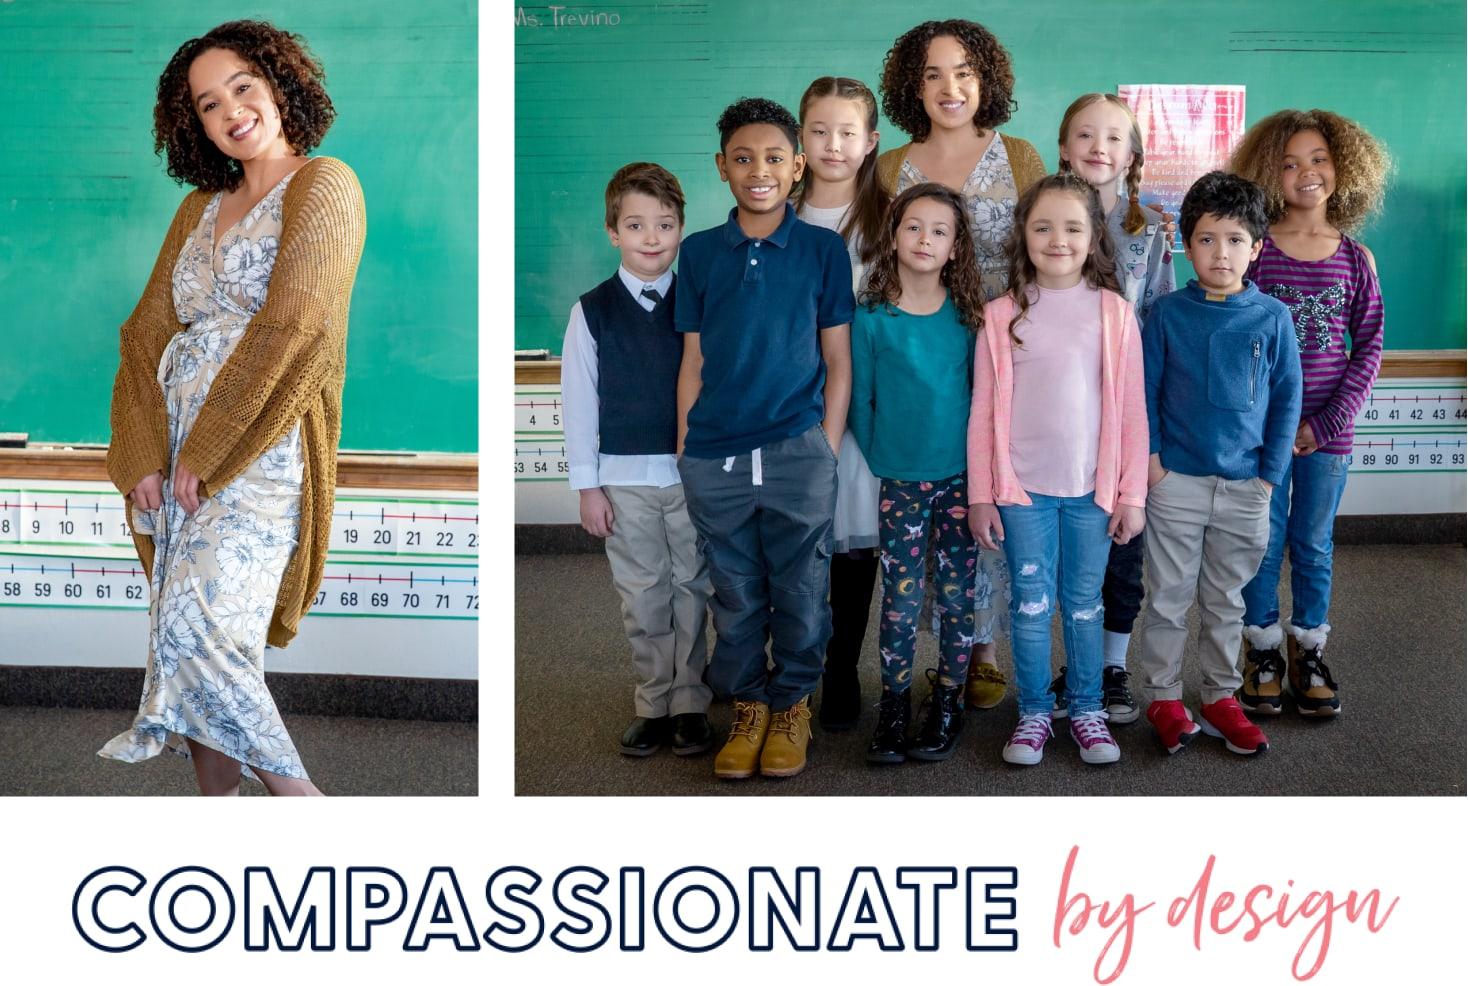 Compassionate by Design